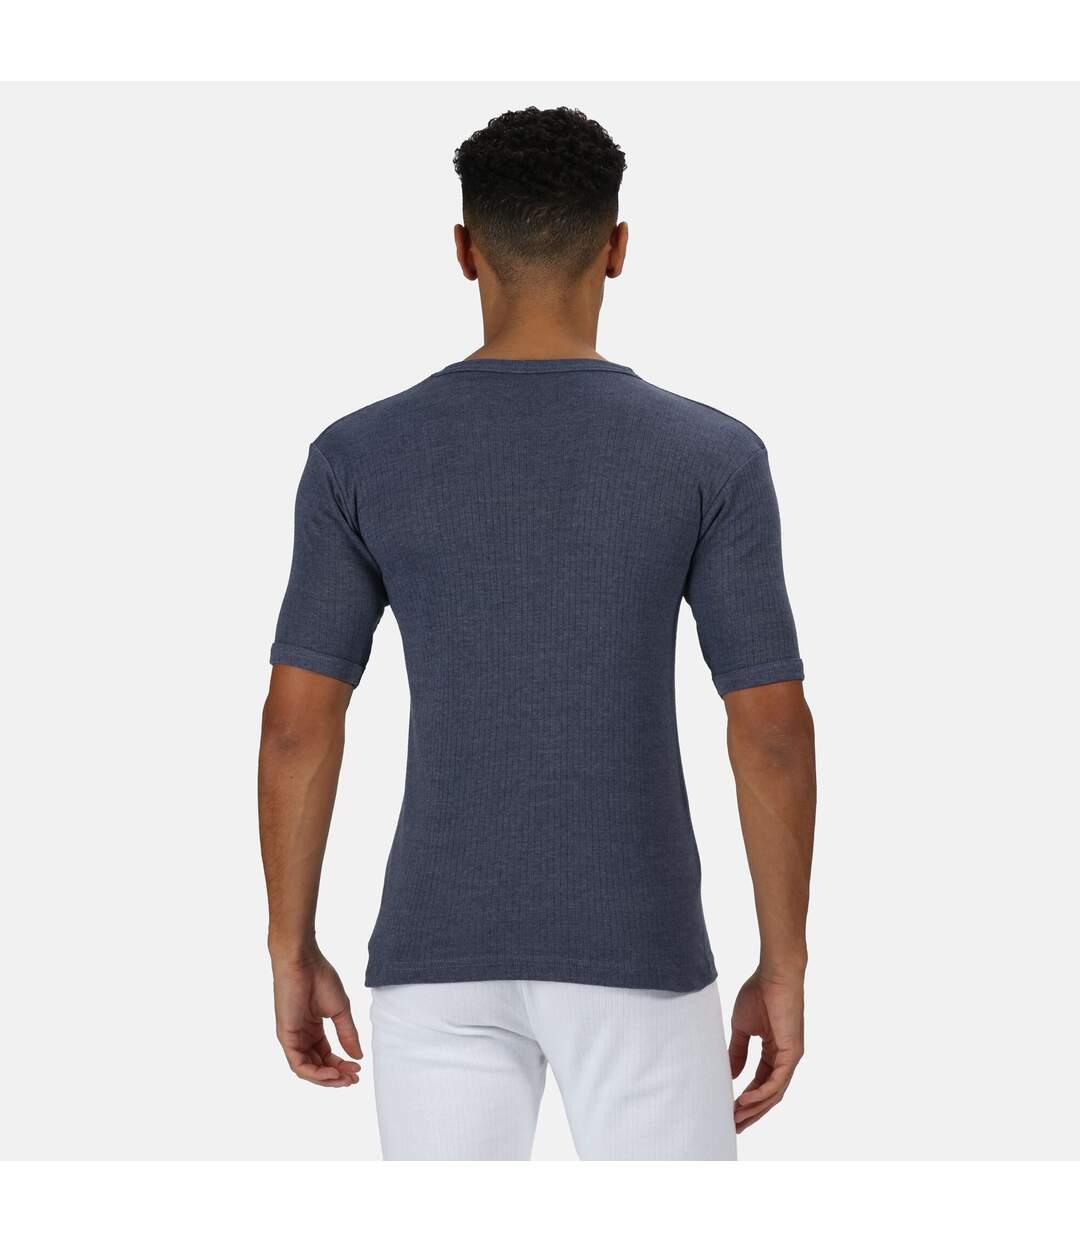 Regatta Mens Thermal Underwear Short Sleeve Vest / T-Shirt (Denim Blue) - UTRG1427